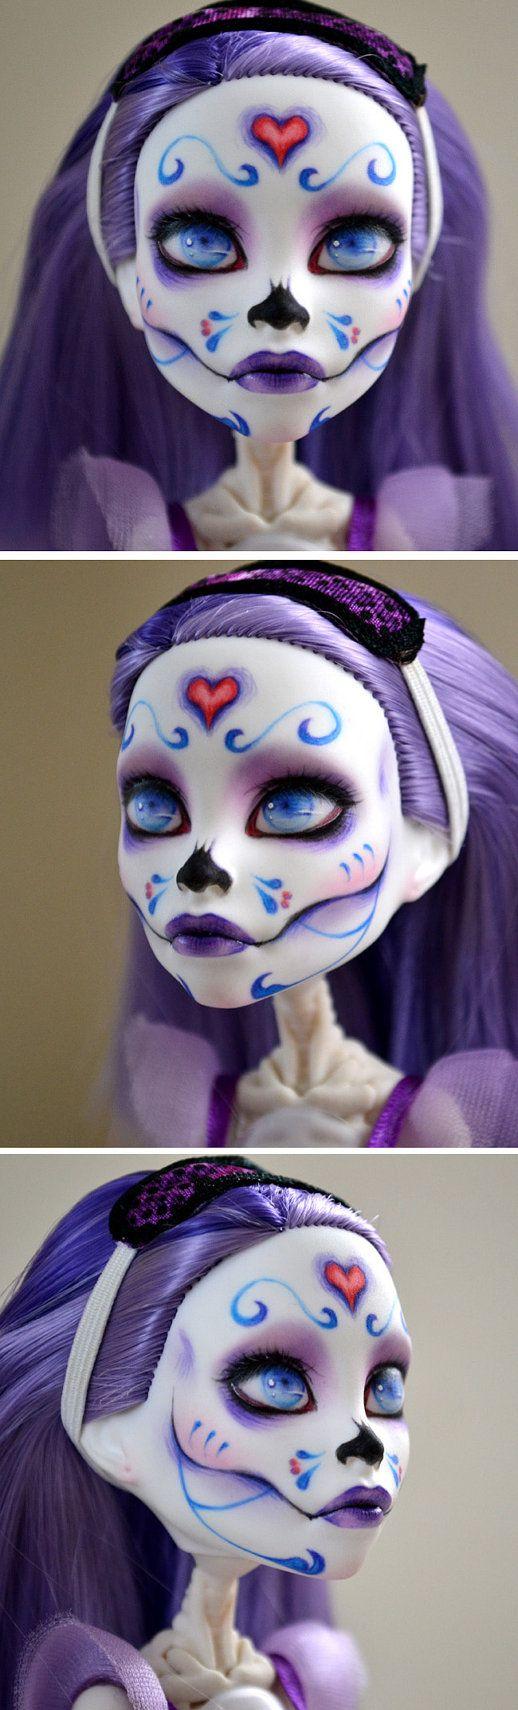 Custom Monster High Spectra on Skelita Body by BeautybyBotfly, $70.00